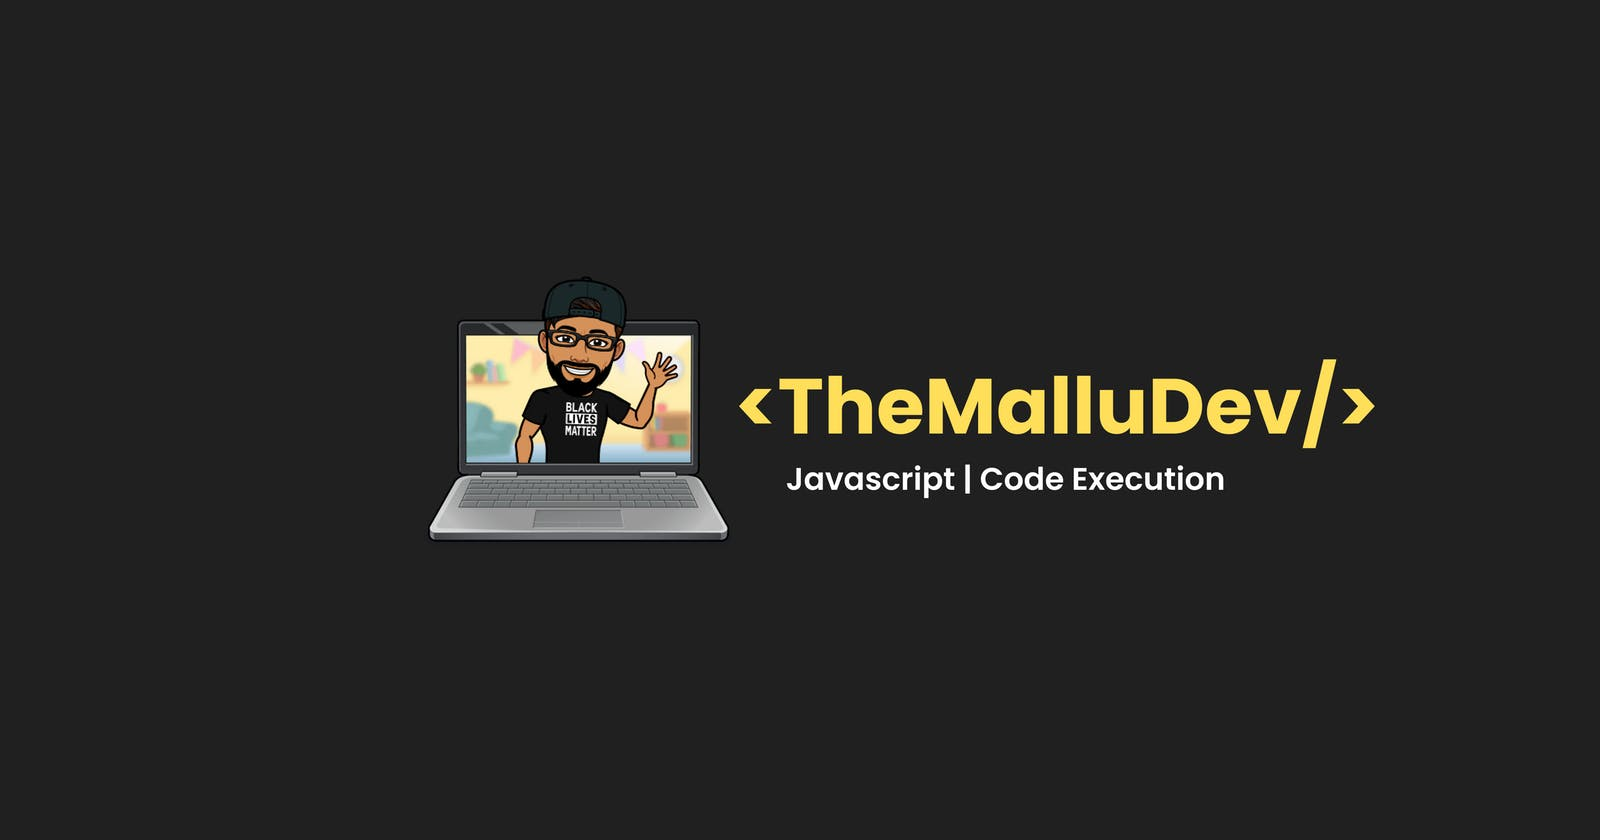 Demystifying Javascript Code Execution